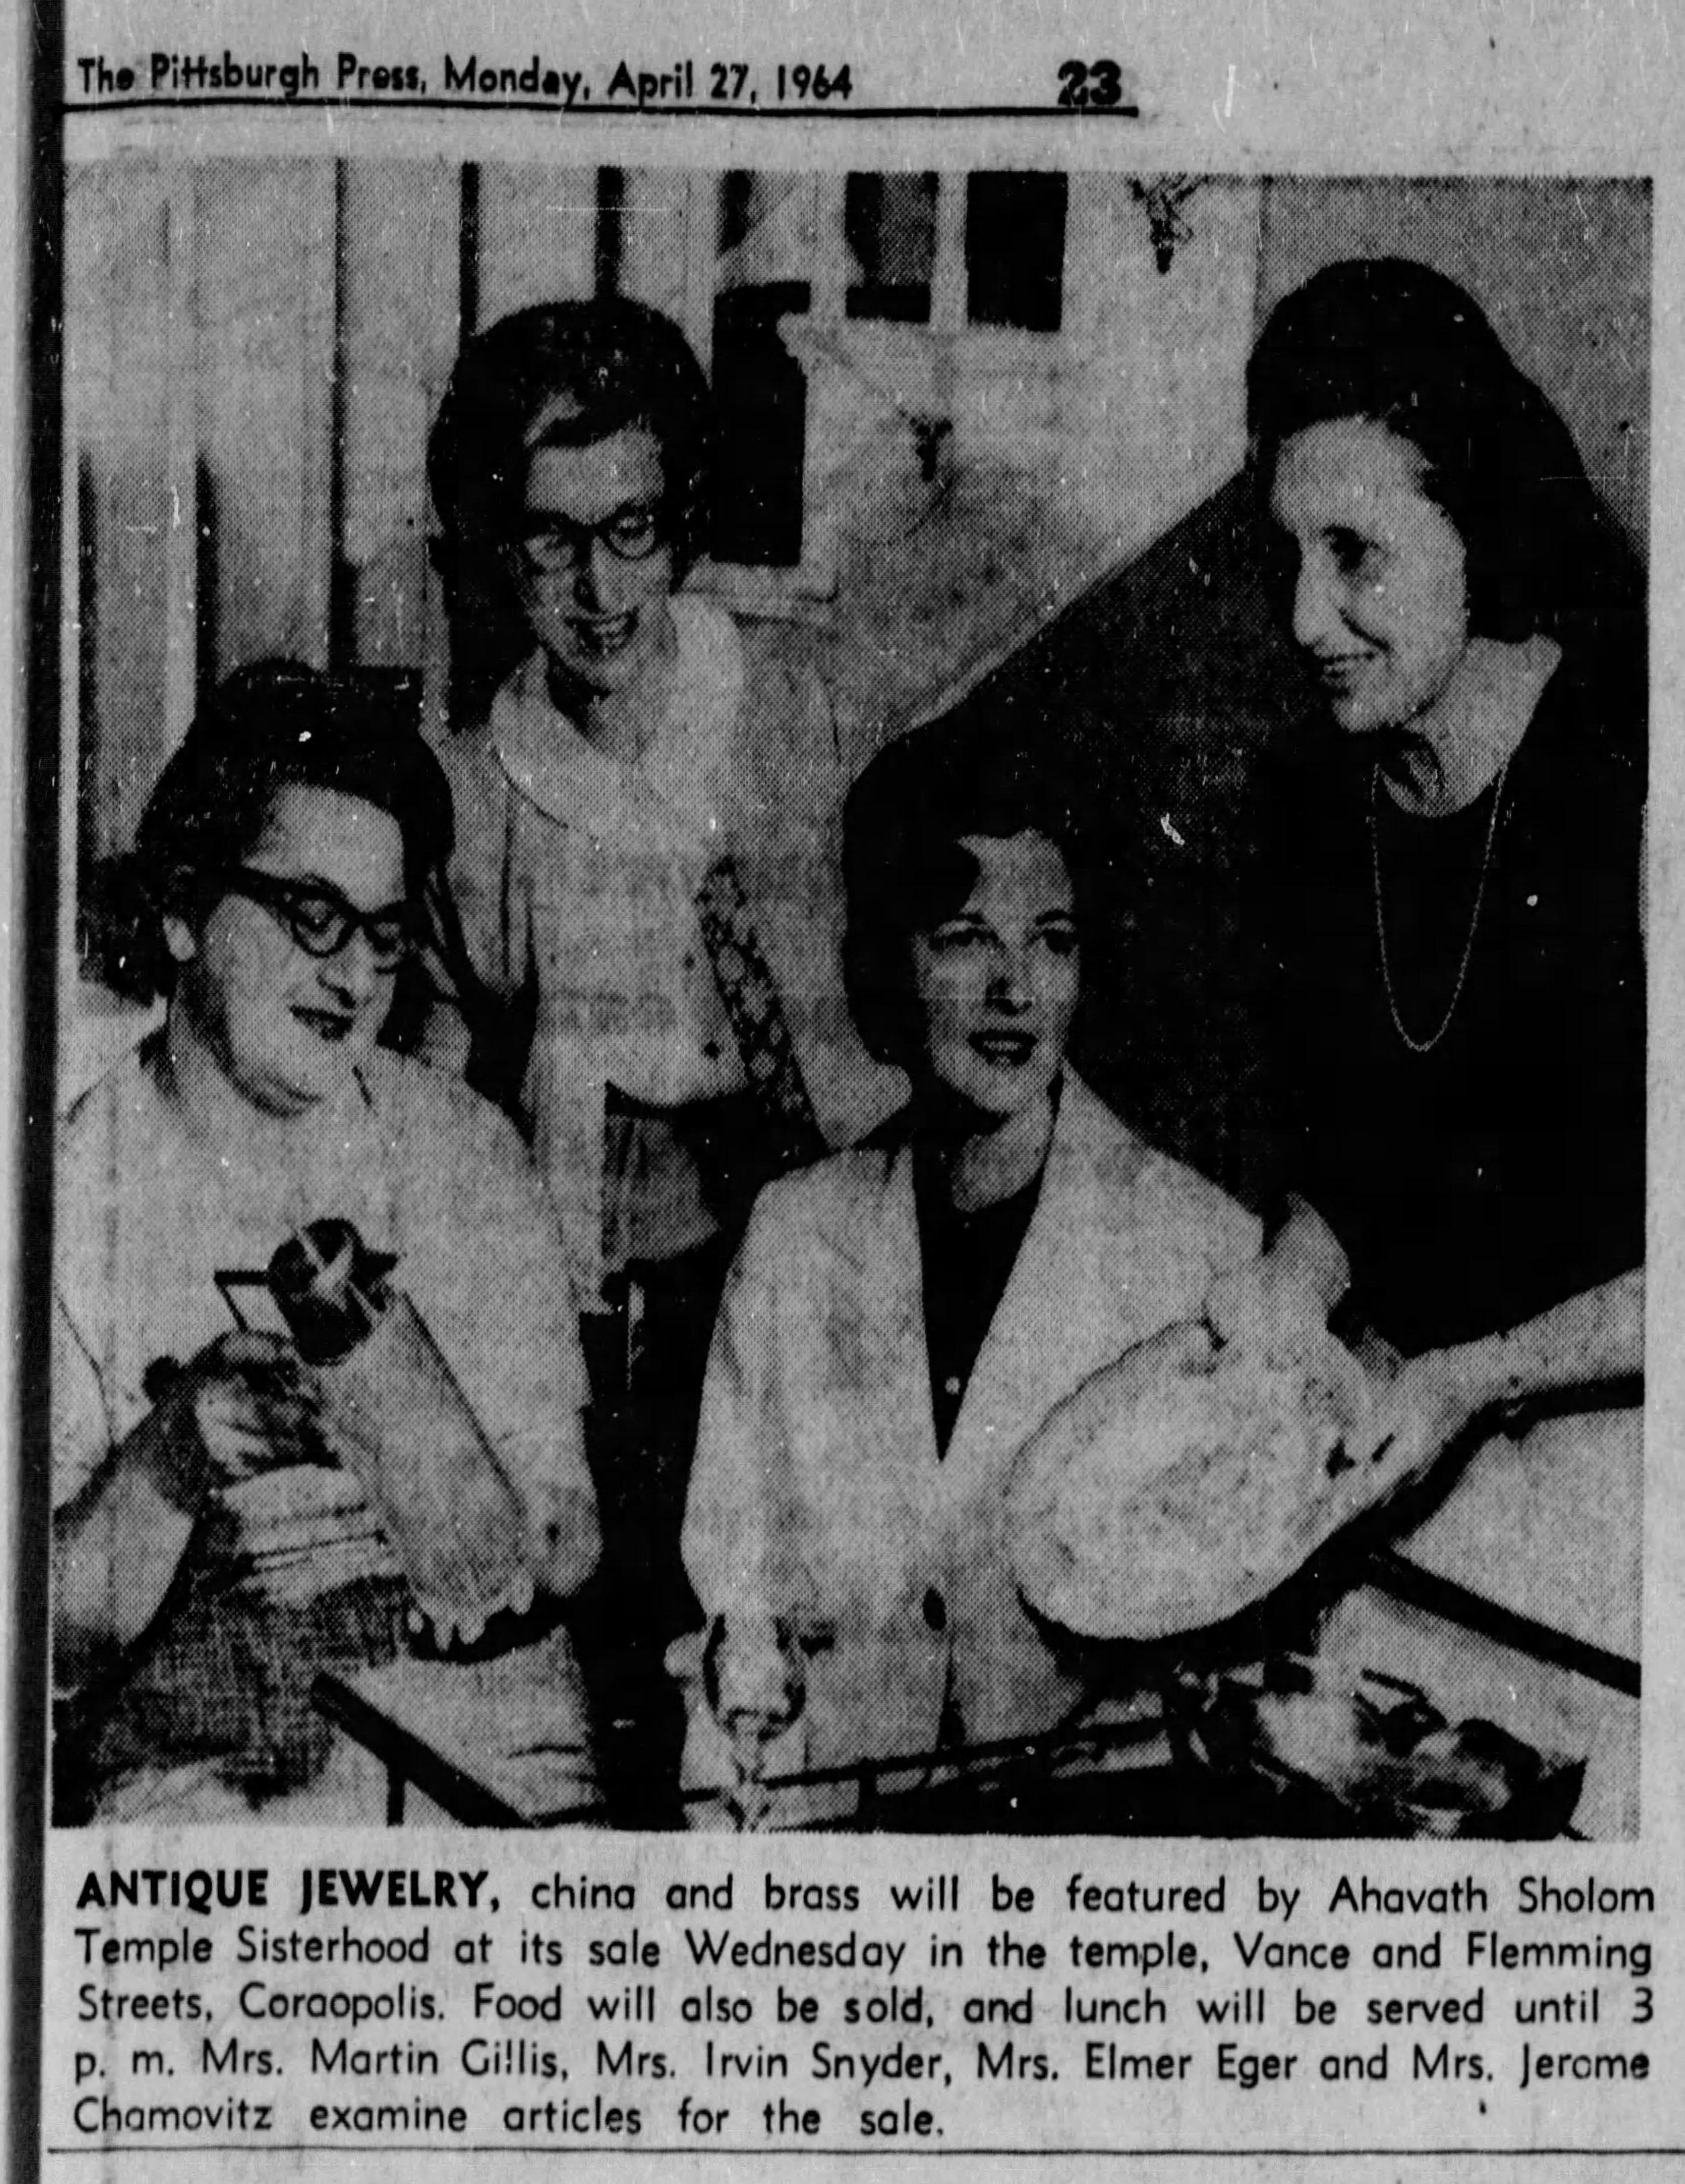 1964-04-27 The Pittsburgh Press (v80, n305, p23)